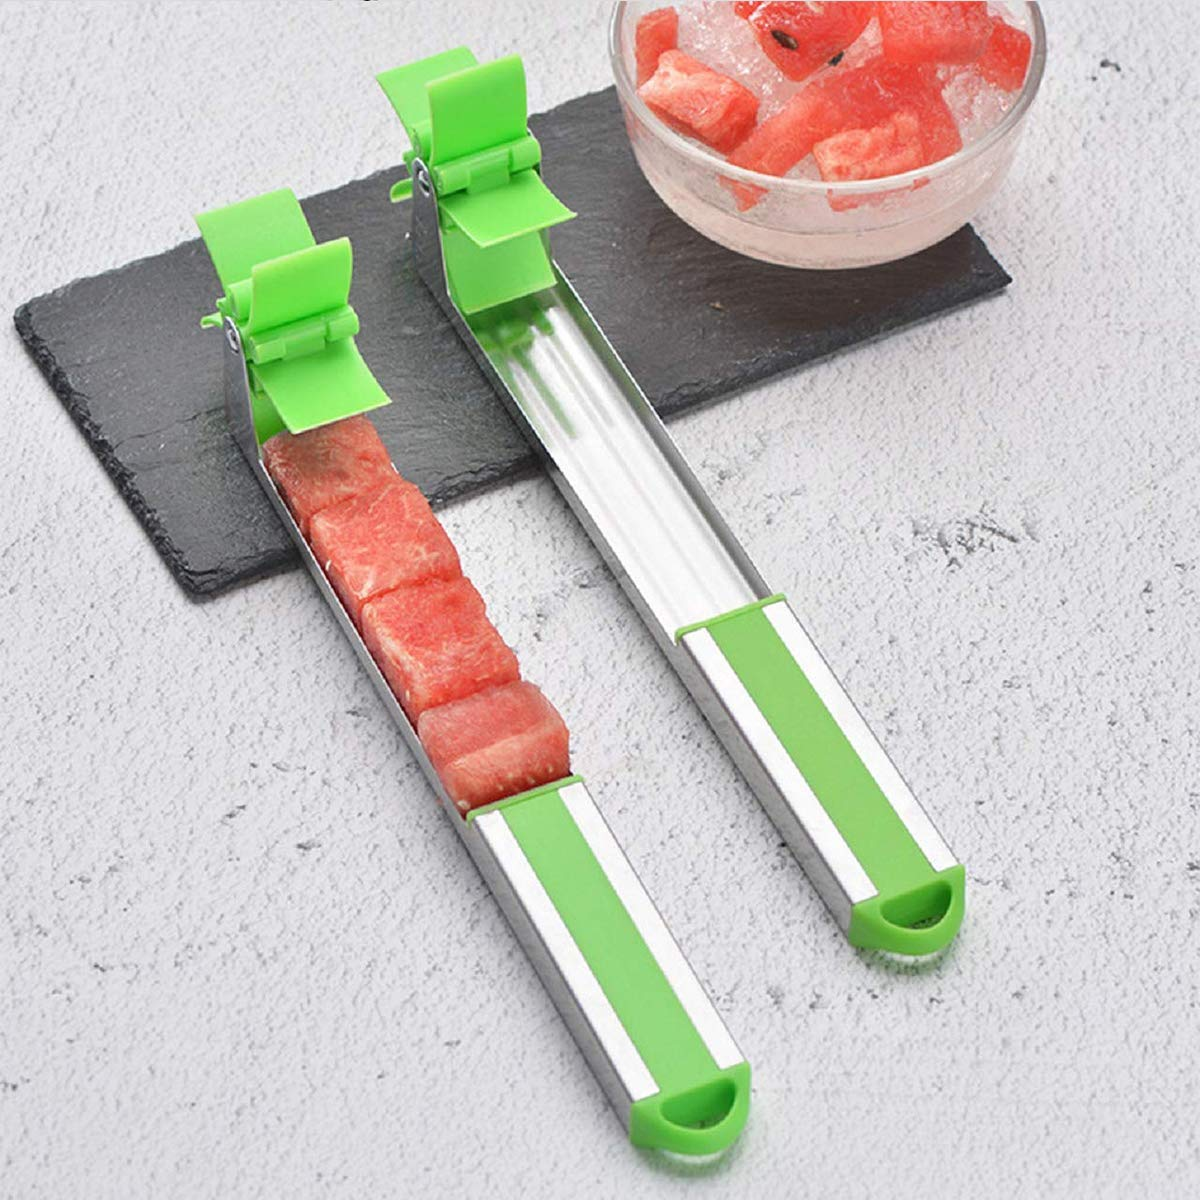 TWBB 2 Pack Watermelon Slicer Cutter Watermelon Windmill Slicer Creative Stainless Steel Watermelon Windmill Cutter by TWBB